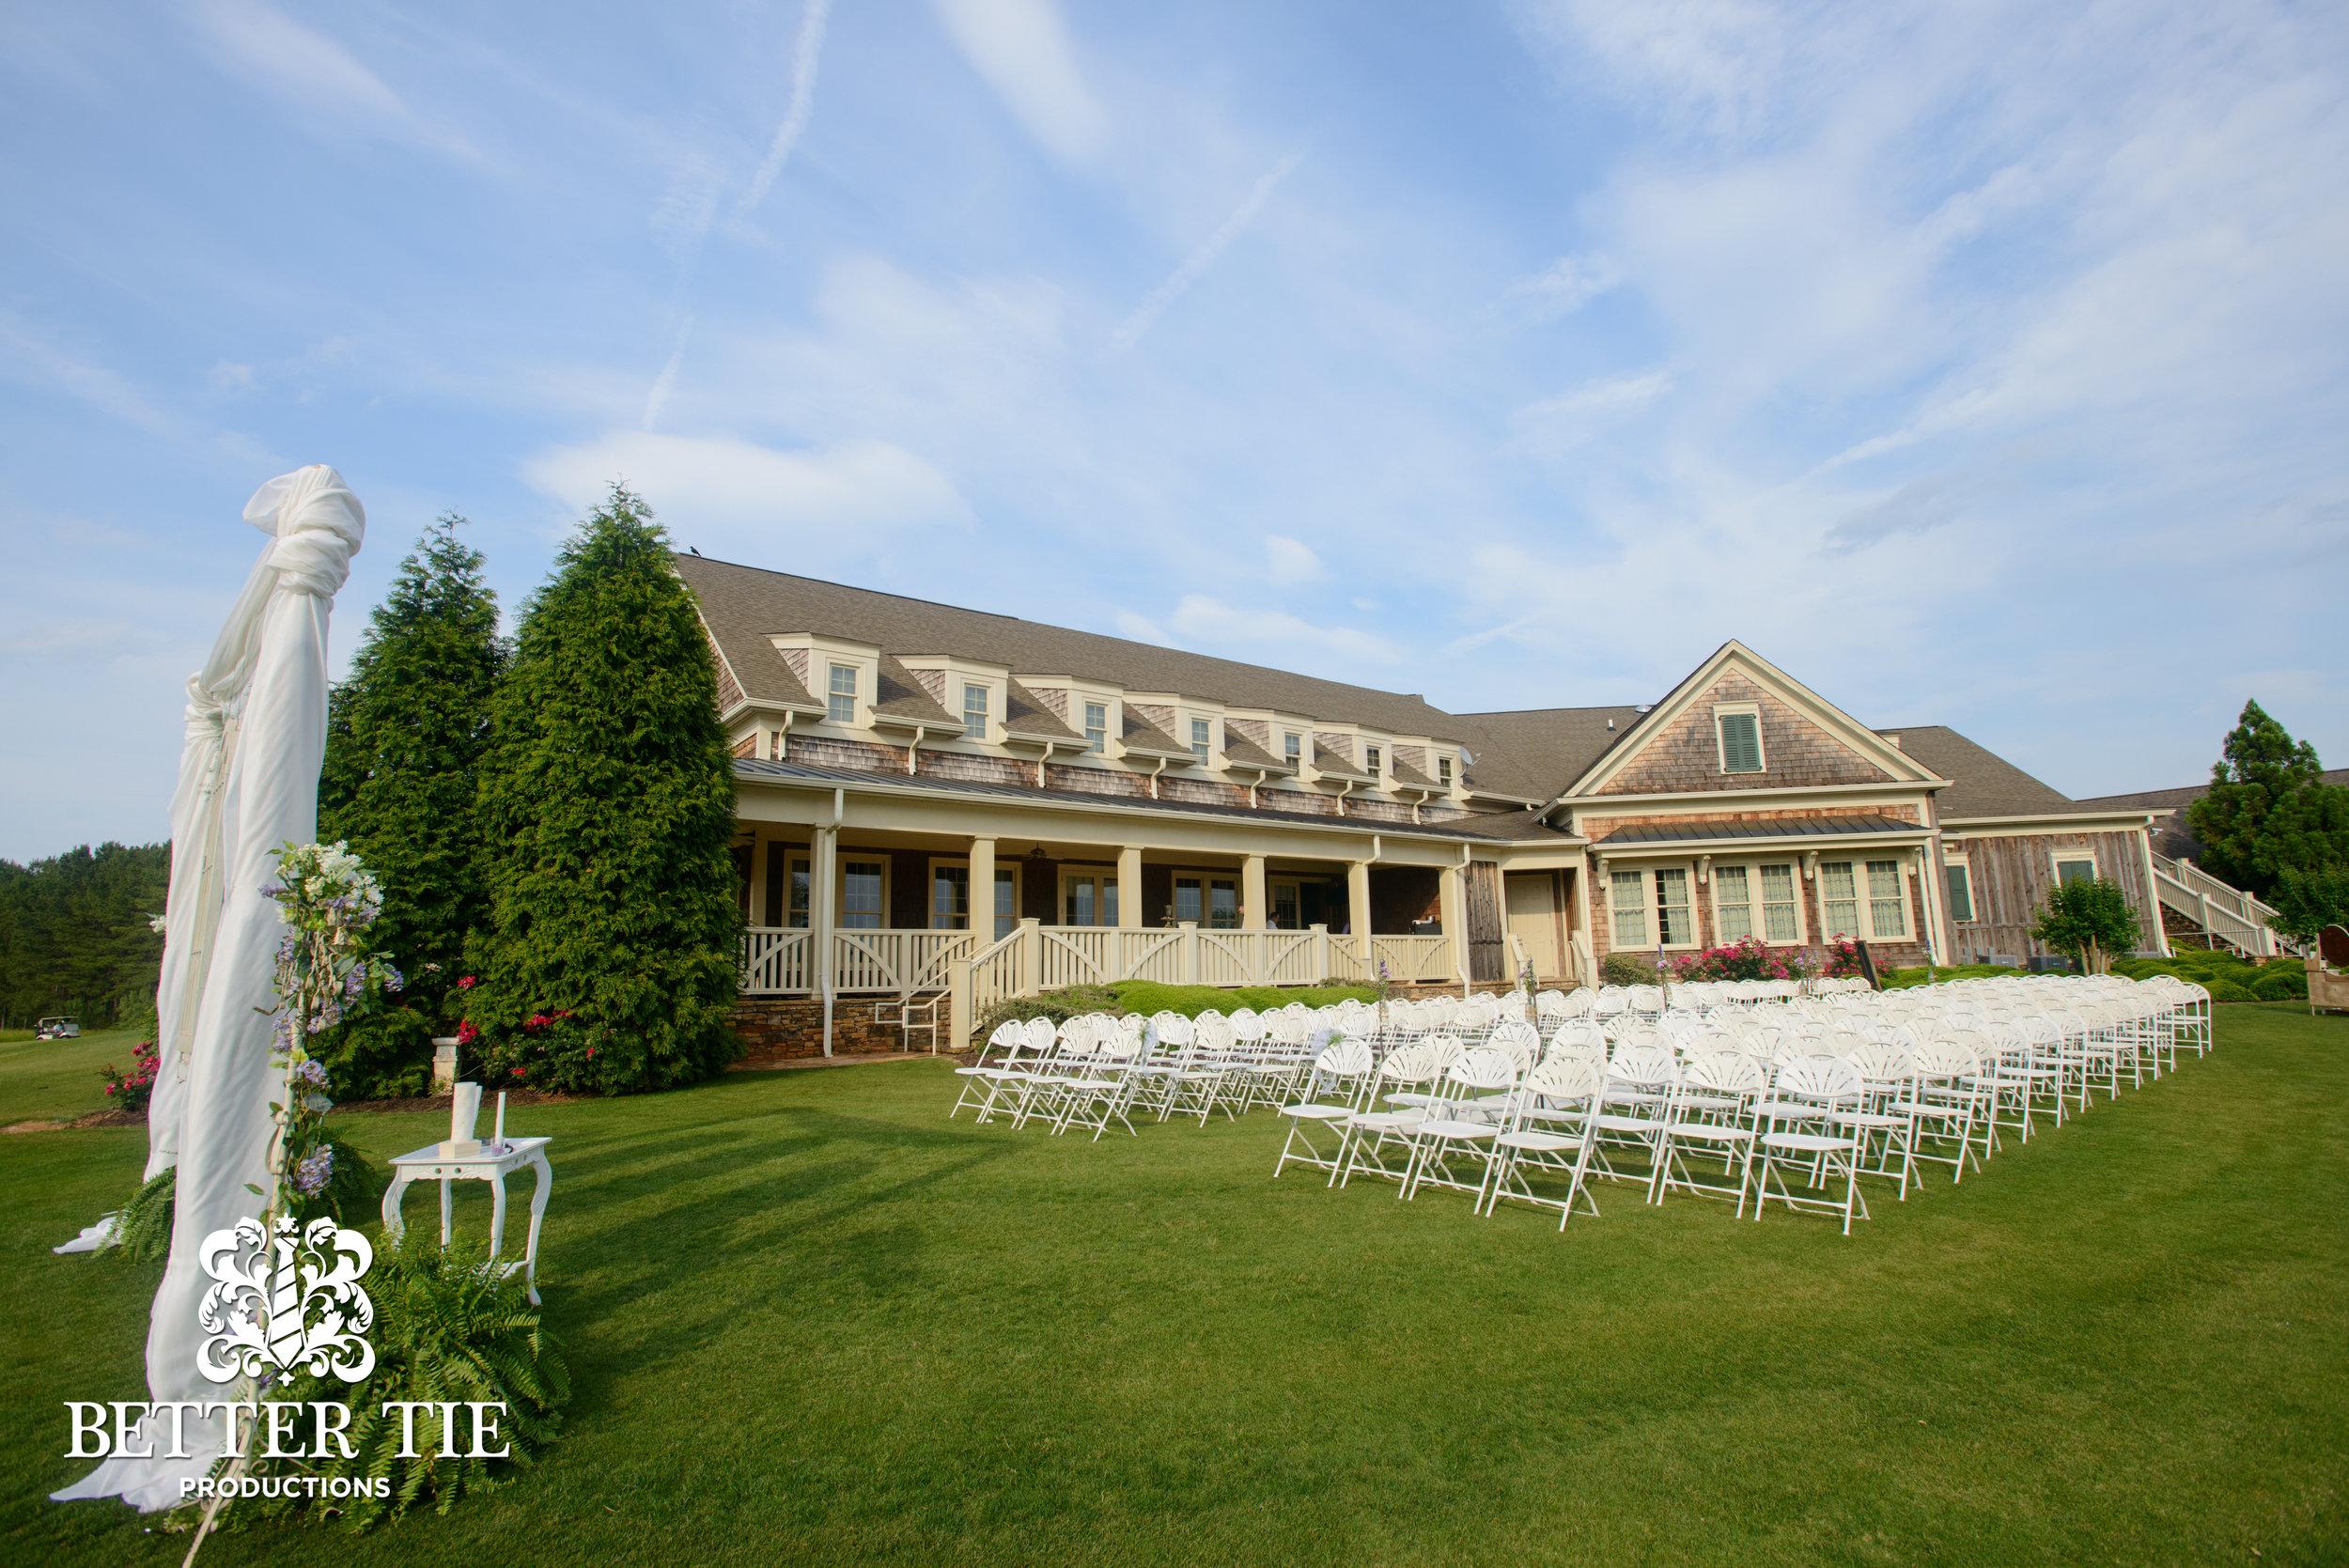 cateechee-golf-club-wedding-15.jpg